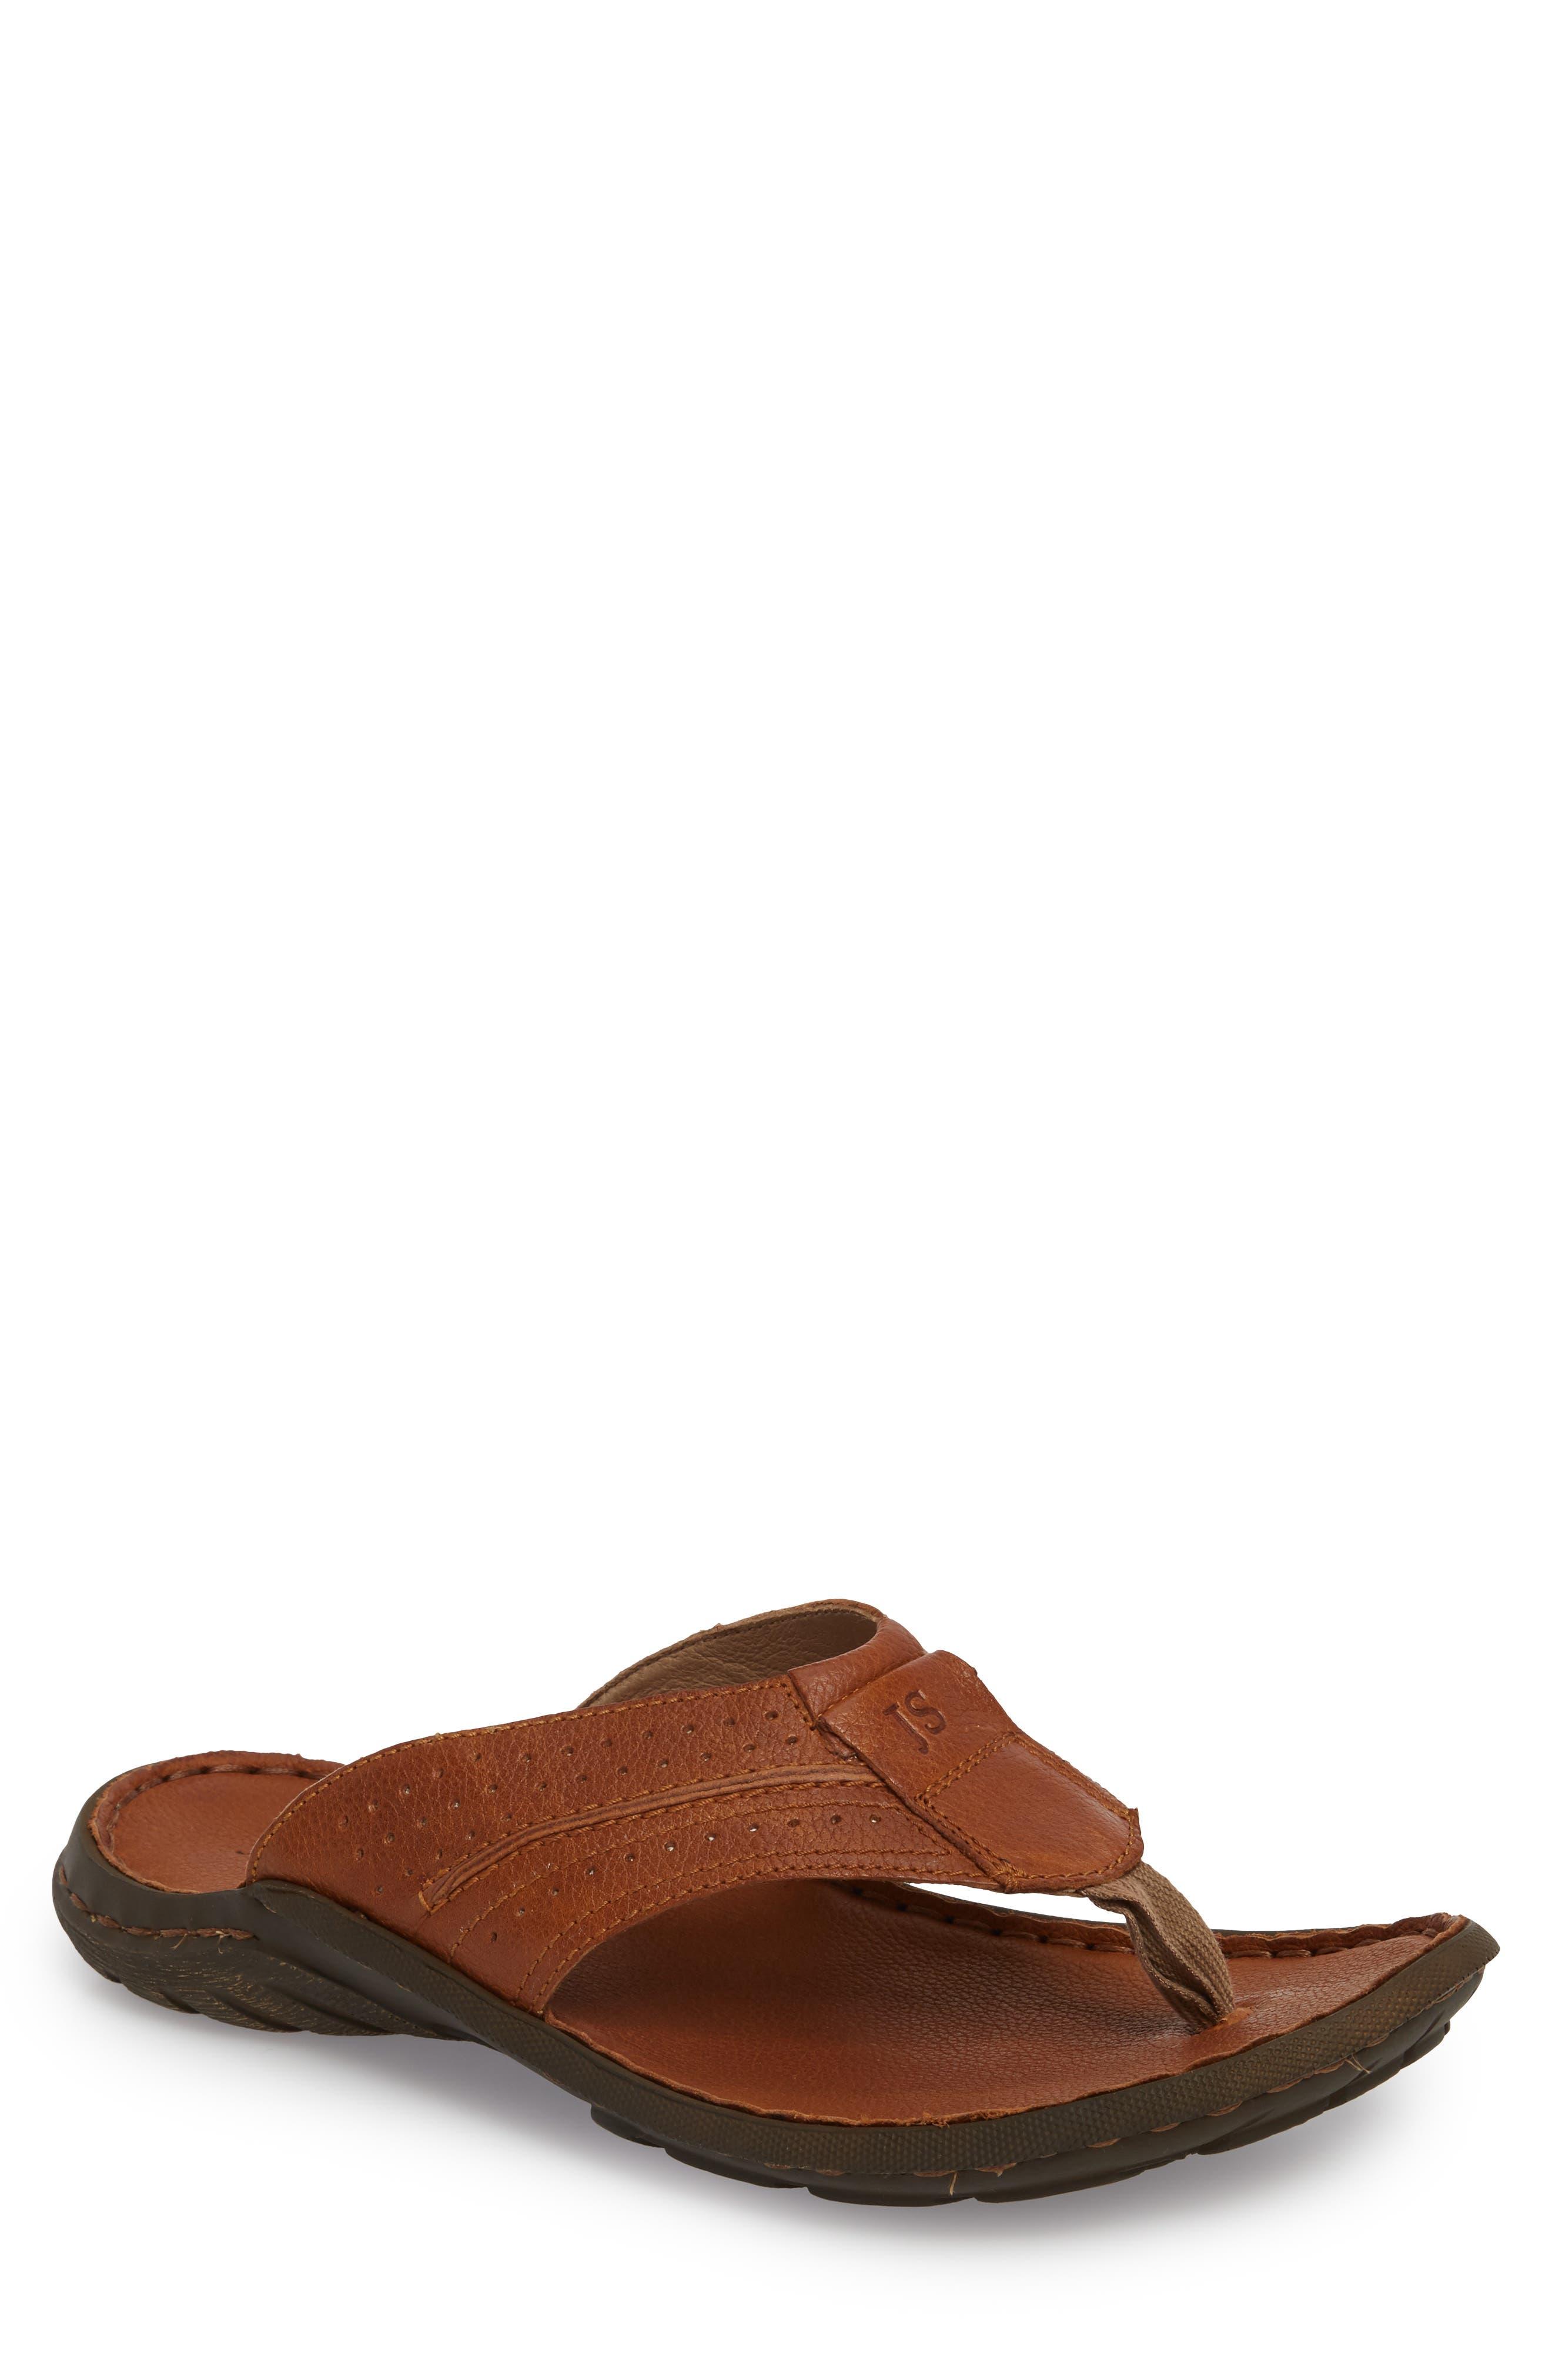 Logan Flip Flop,                         Main,                         color,